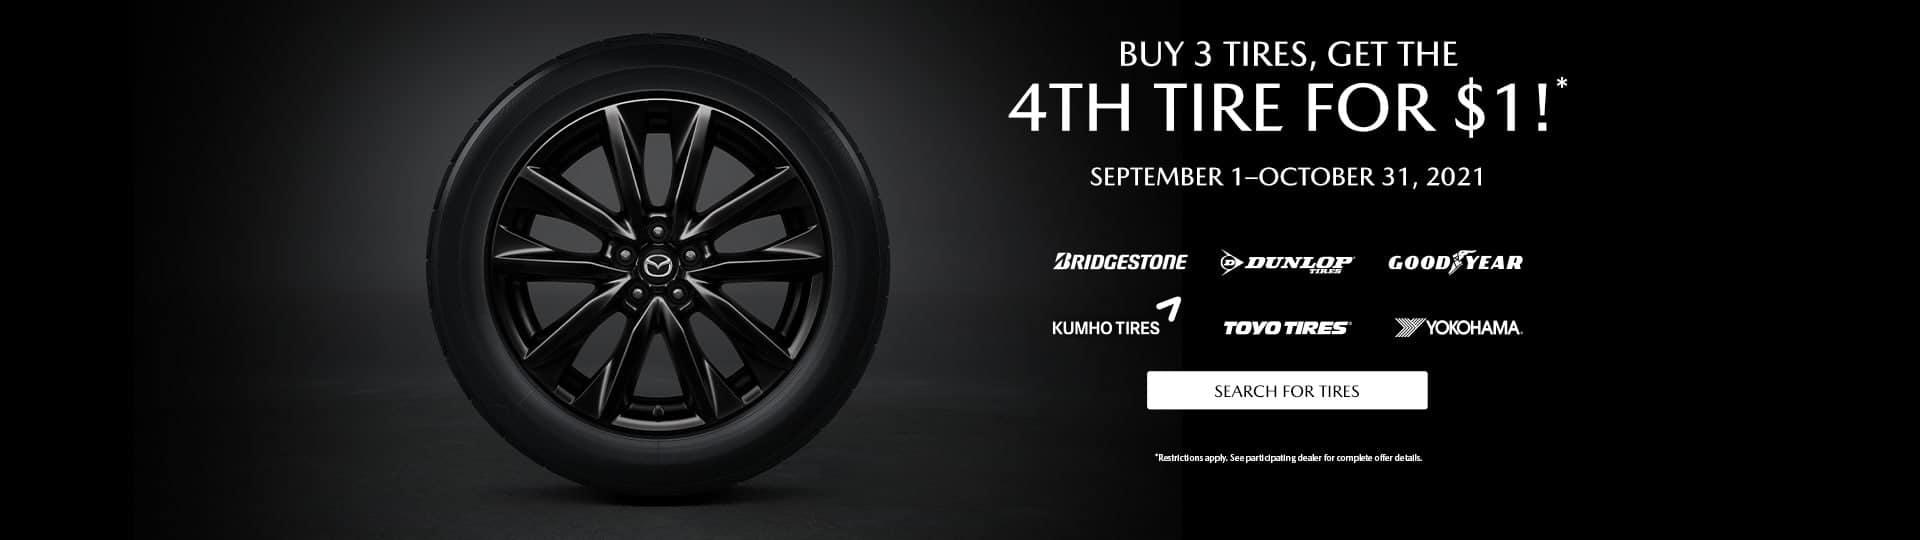 Mazda Car Care – Wheel Balance, Tire Rotation & Brake Inspection